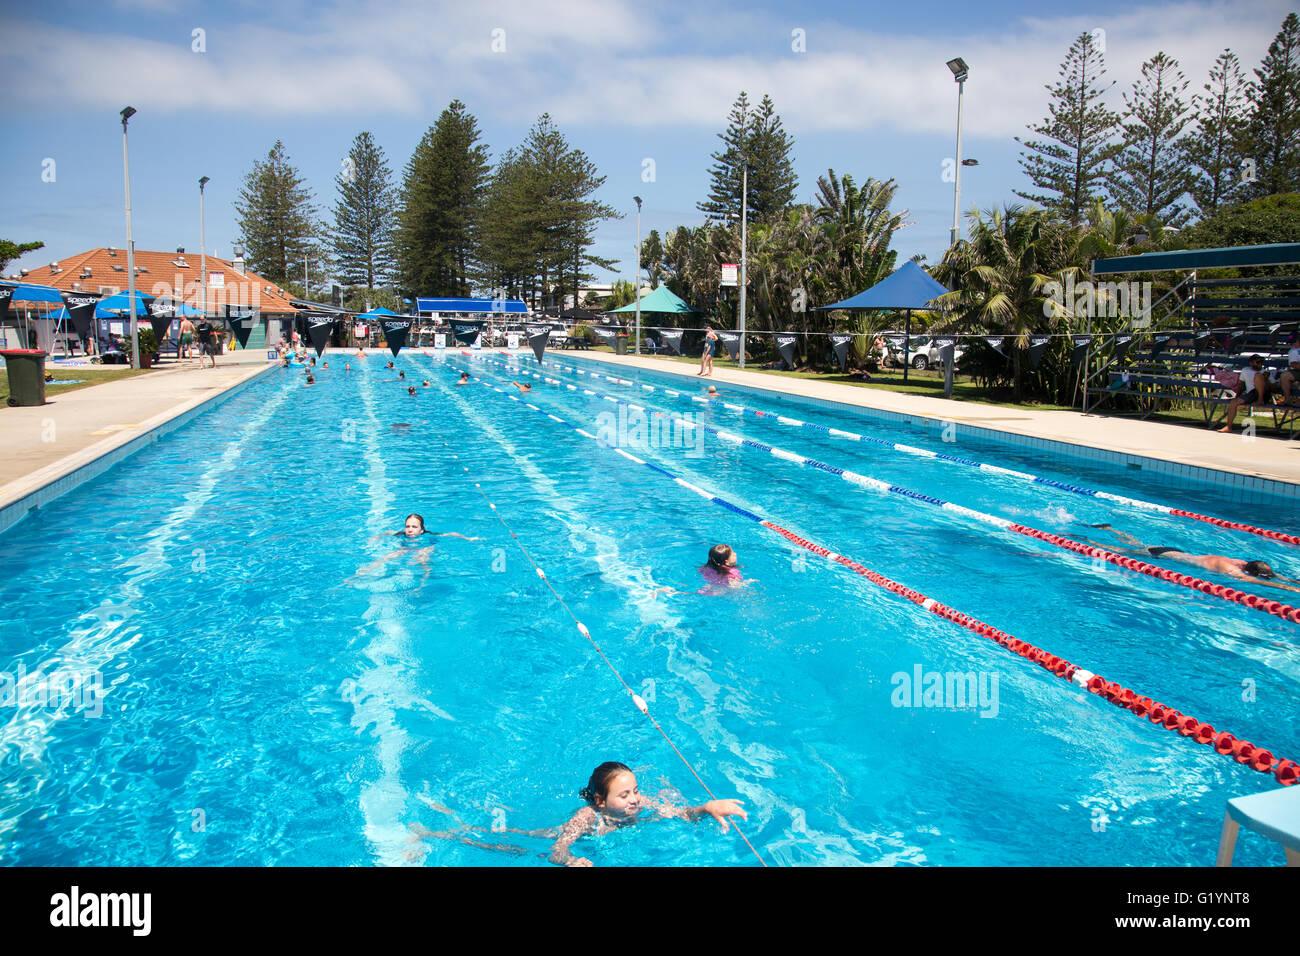 Public swimming pool stock photos public swimming pool - Public swimming pools in charlotte nc ...